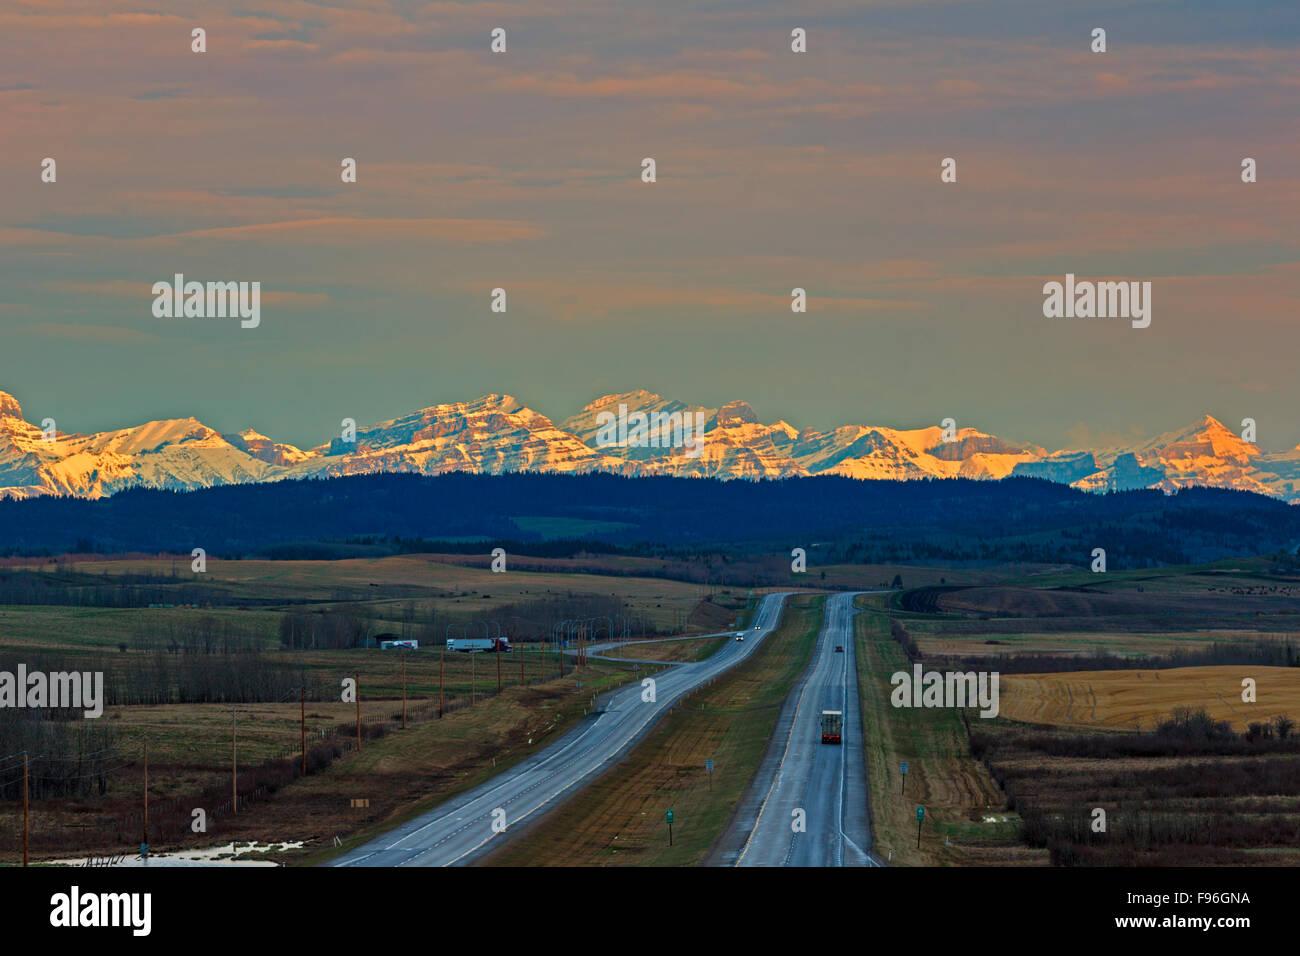 TransCanada highway, Rockey View County, Division No. 6,  Cowboy Trail, Alberta, Canada - Stock Image